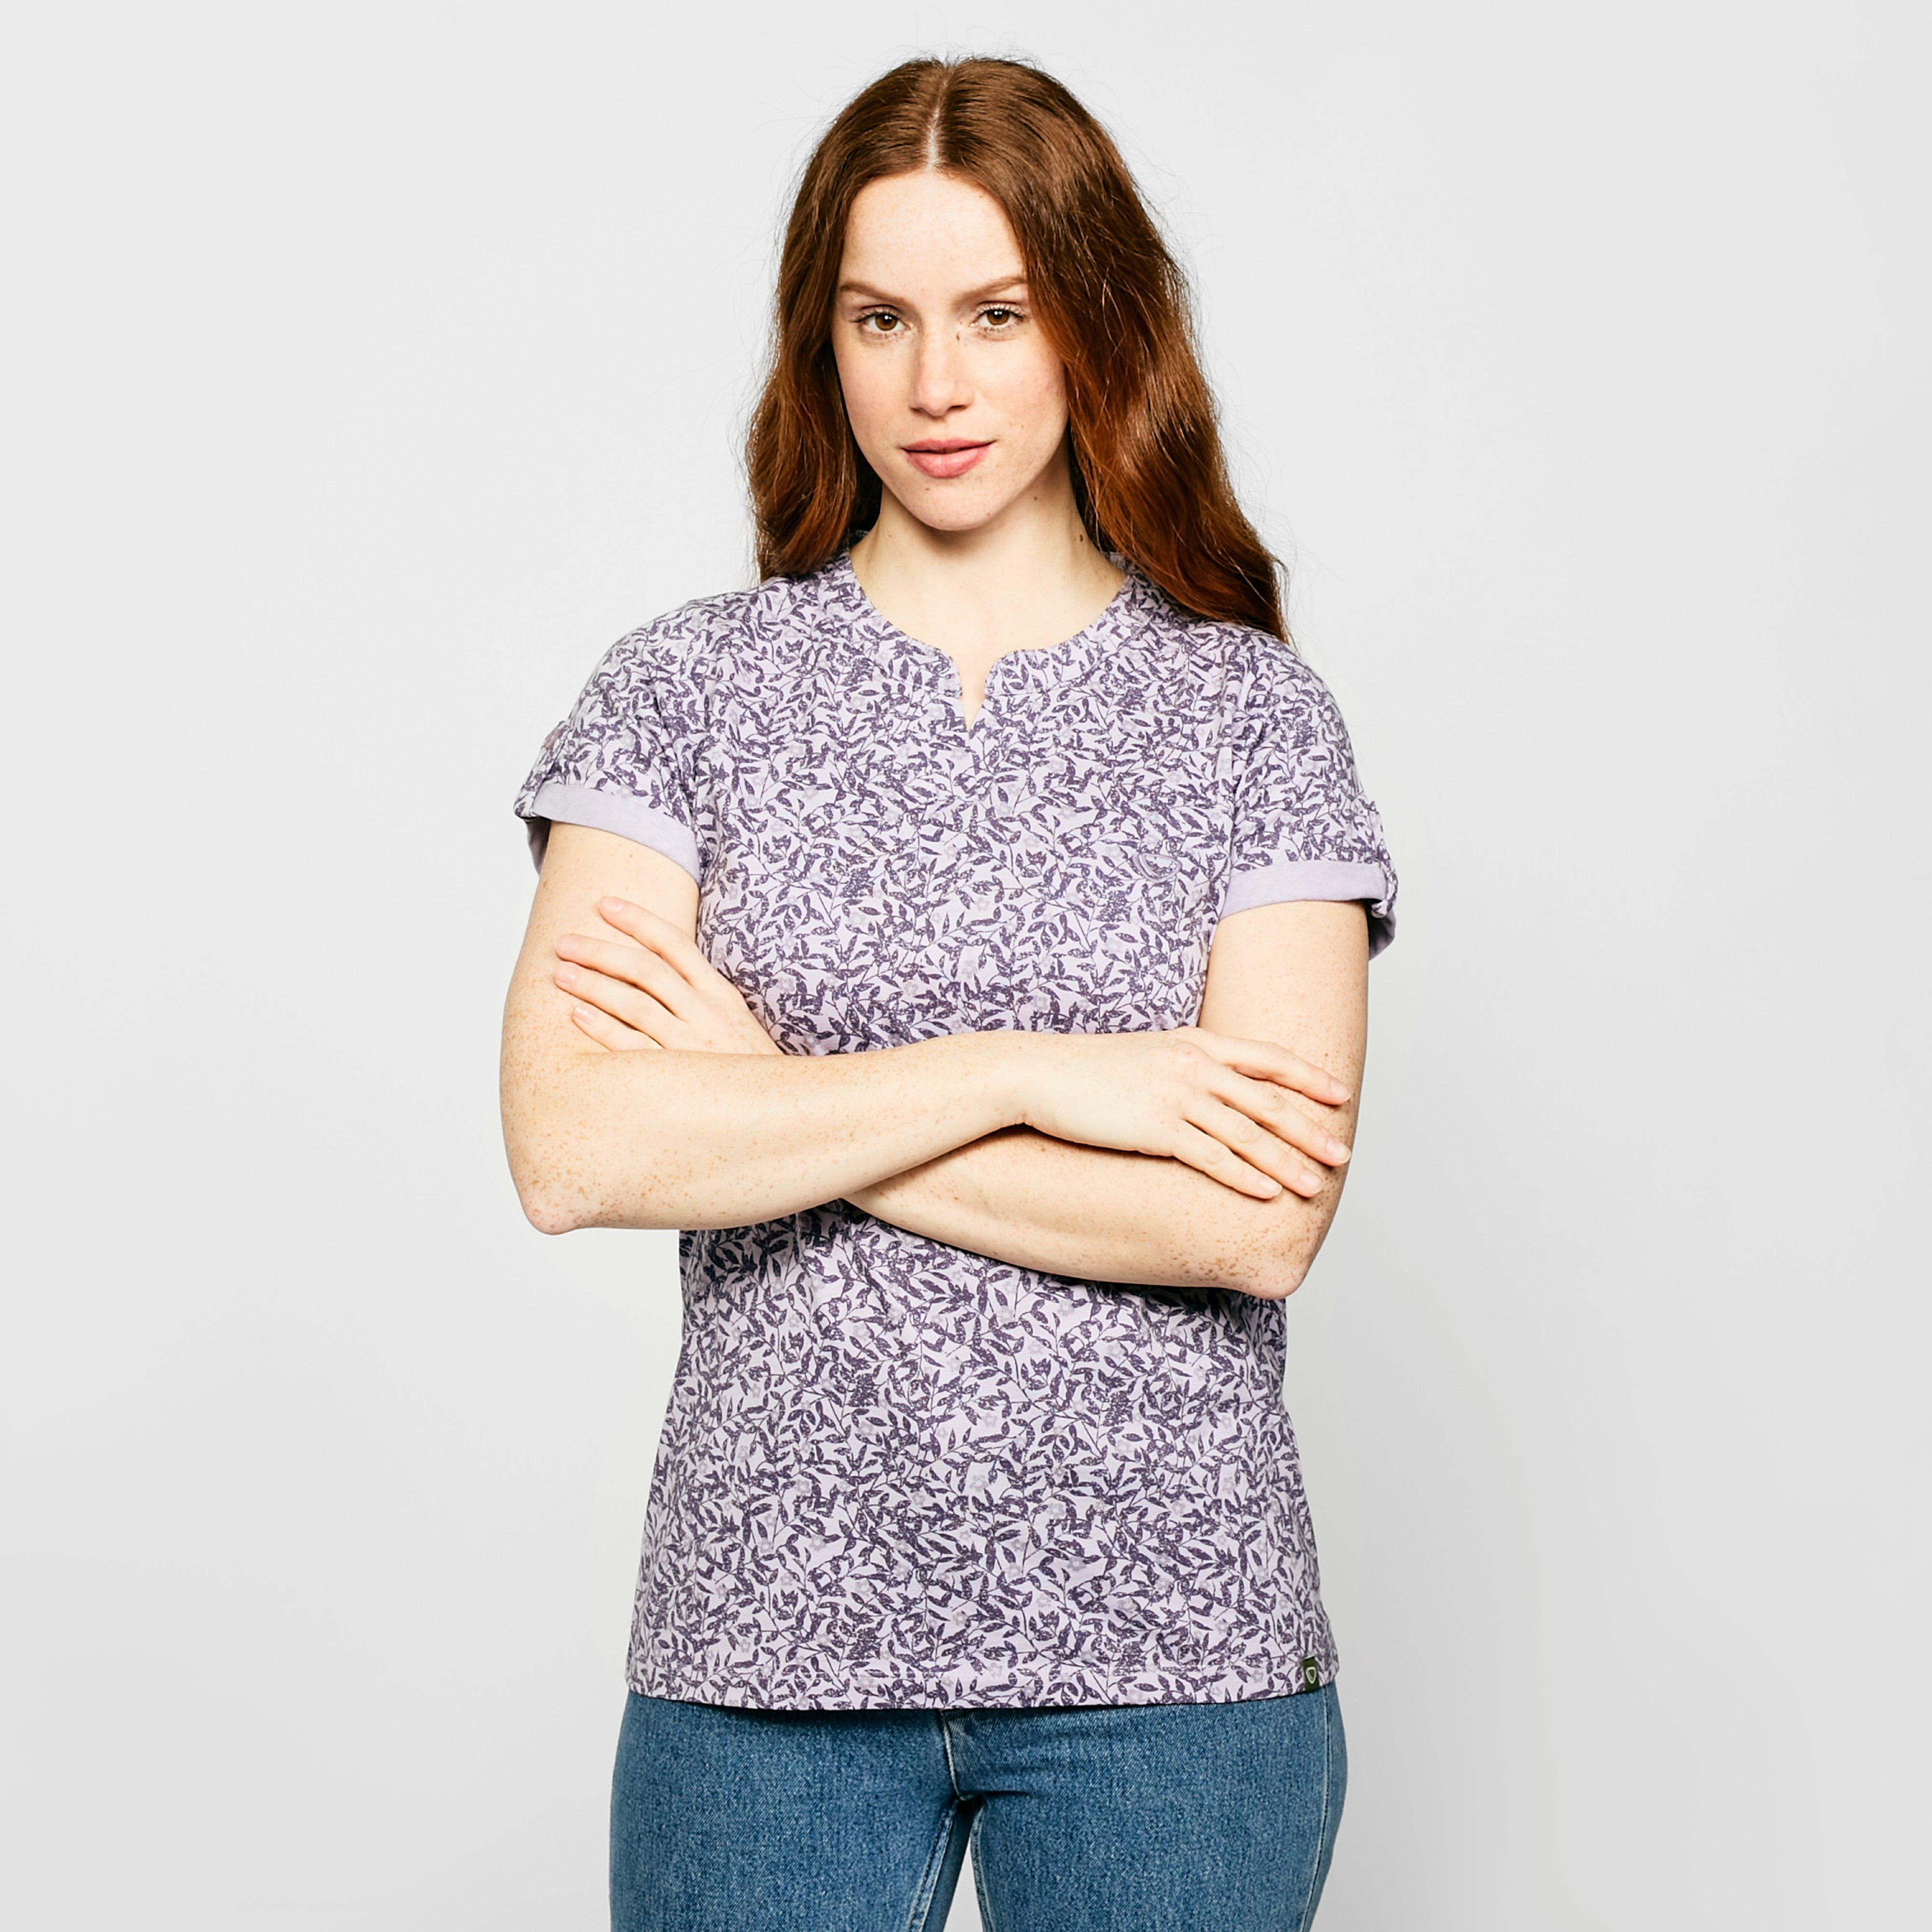 Brasher Brasher Womens AOP Print T-Shirt, Purple